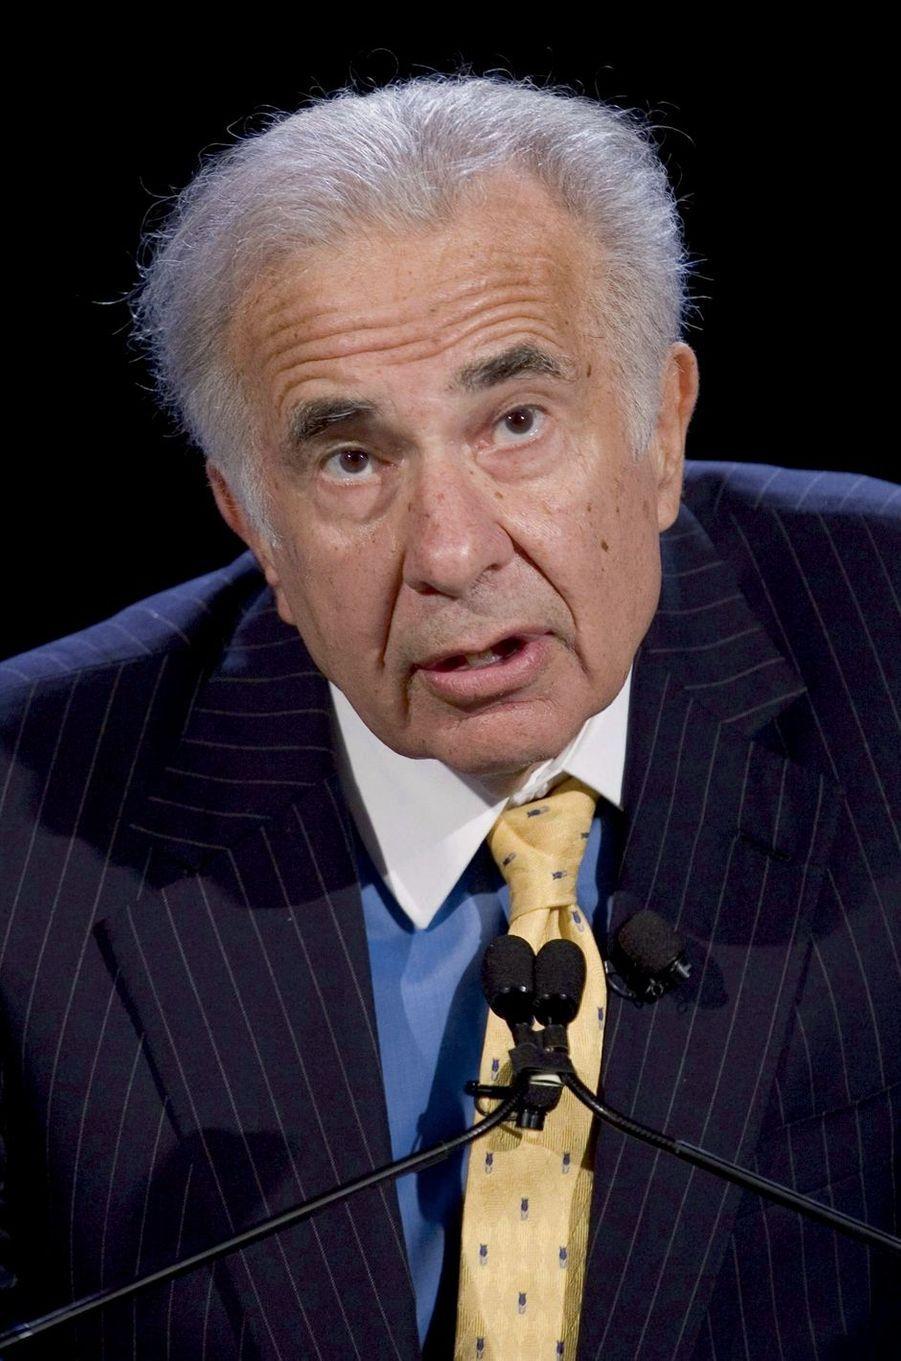 Carl IcahnConseiller spécial (régulation), 80 ans, 16,7 milliards (Icahn Enterprises)